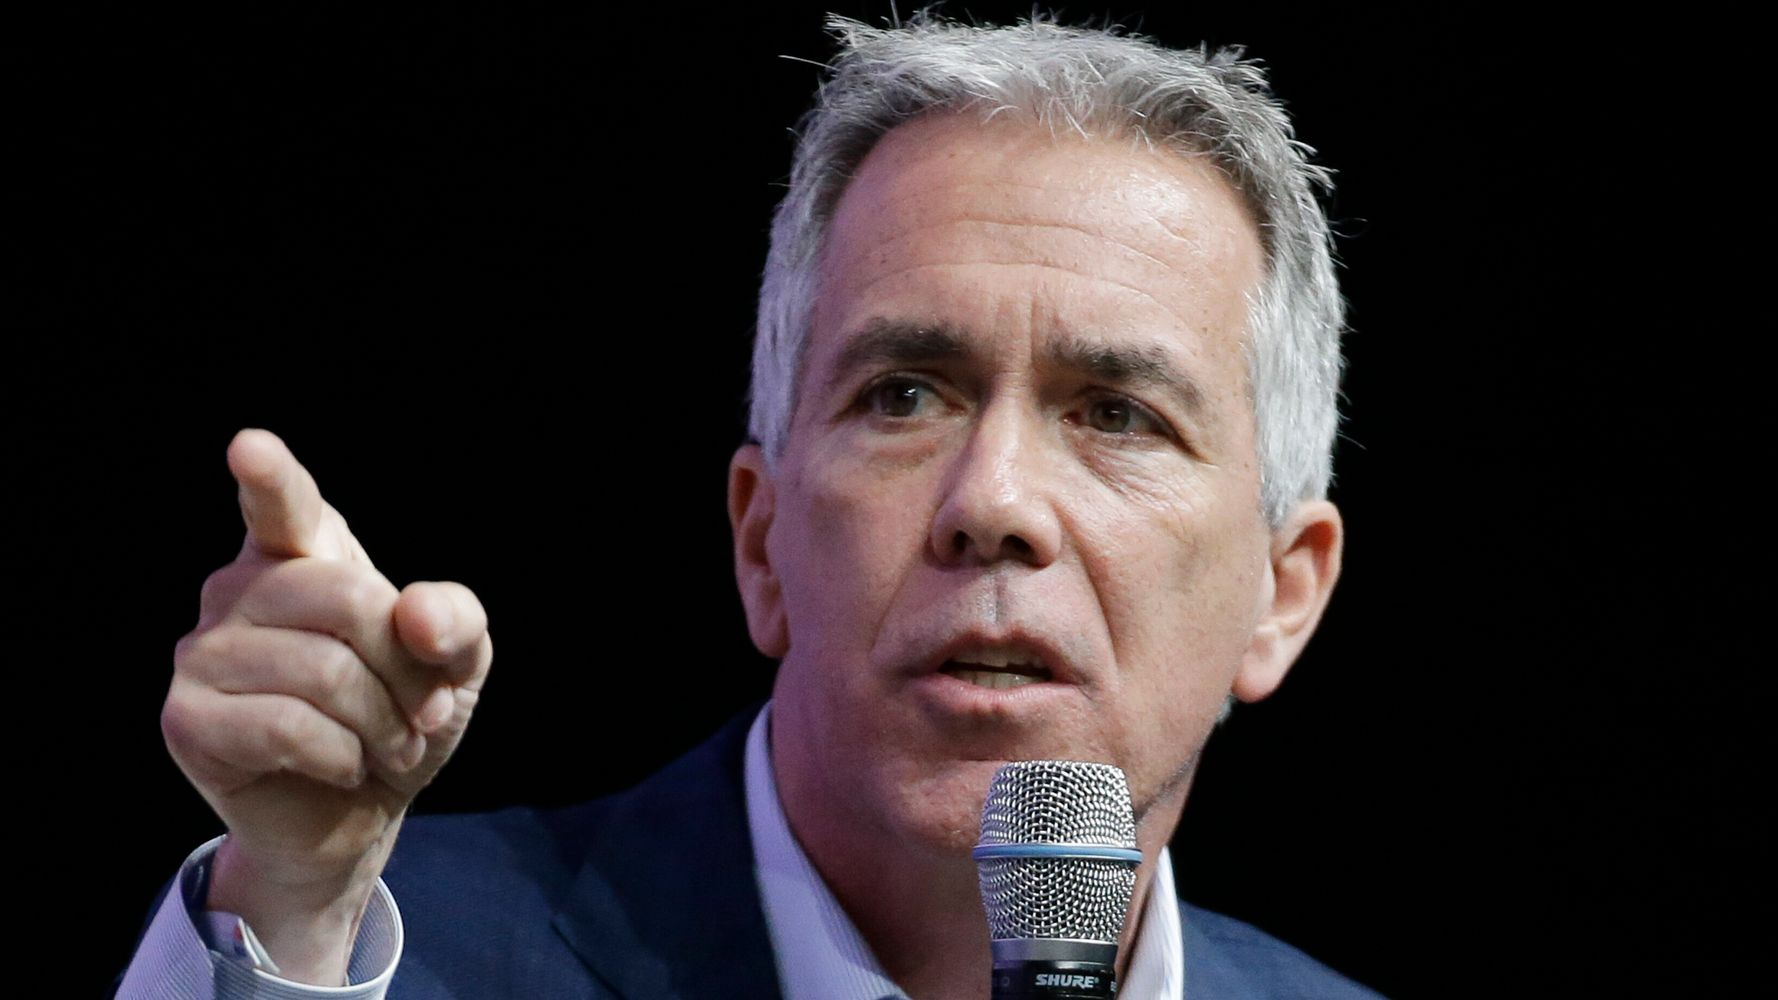 'Never Trump' Means Never: Ex-GOP Lawmaker Joe Walsh Says He'd Vote For Sanders